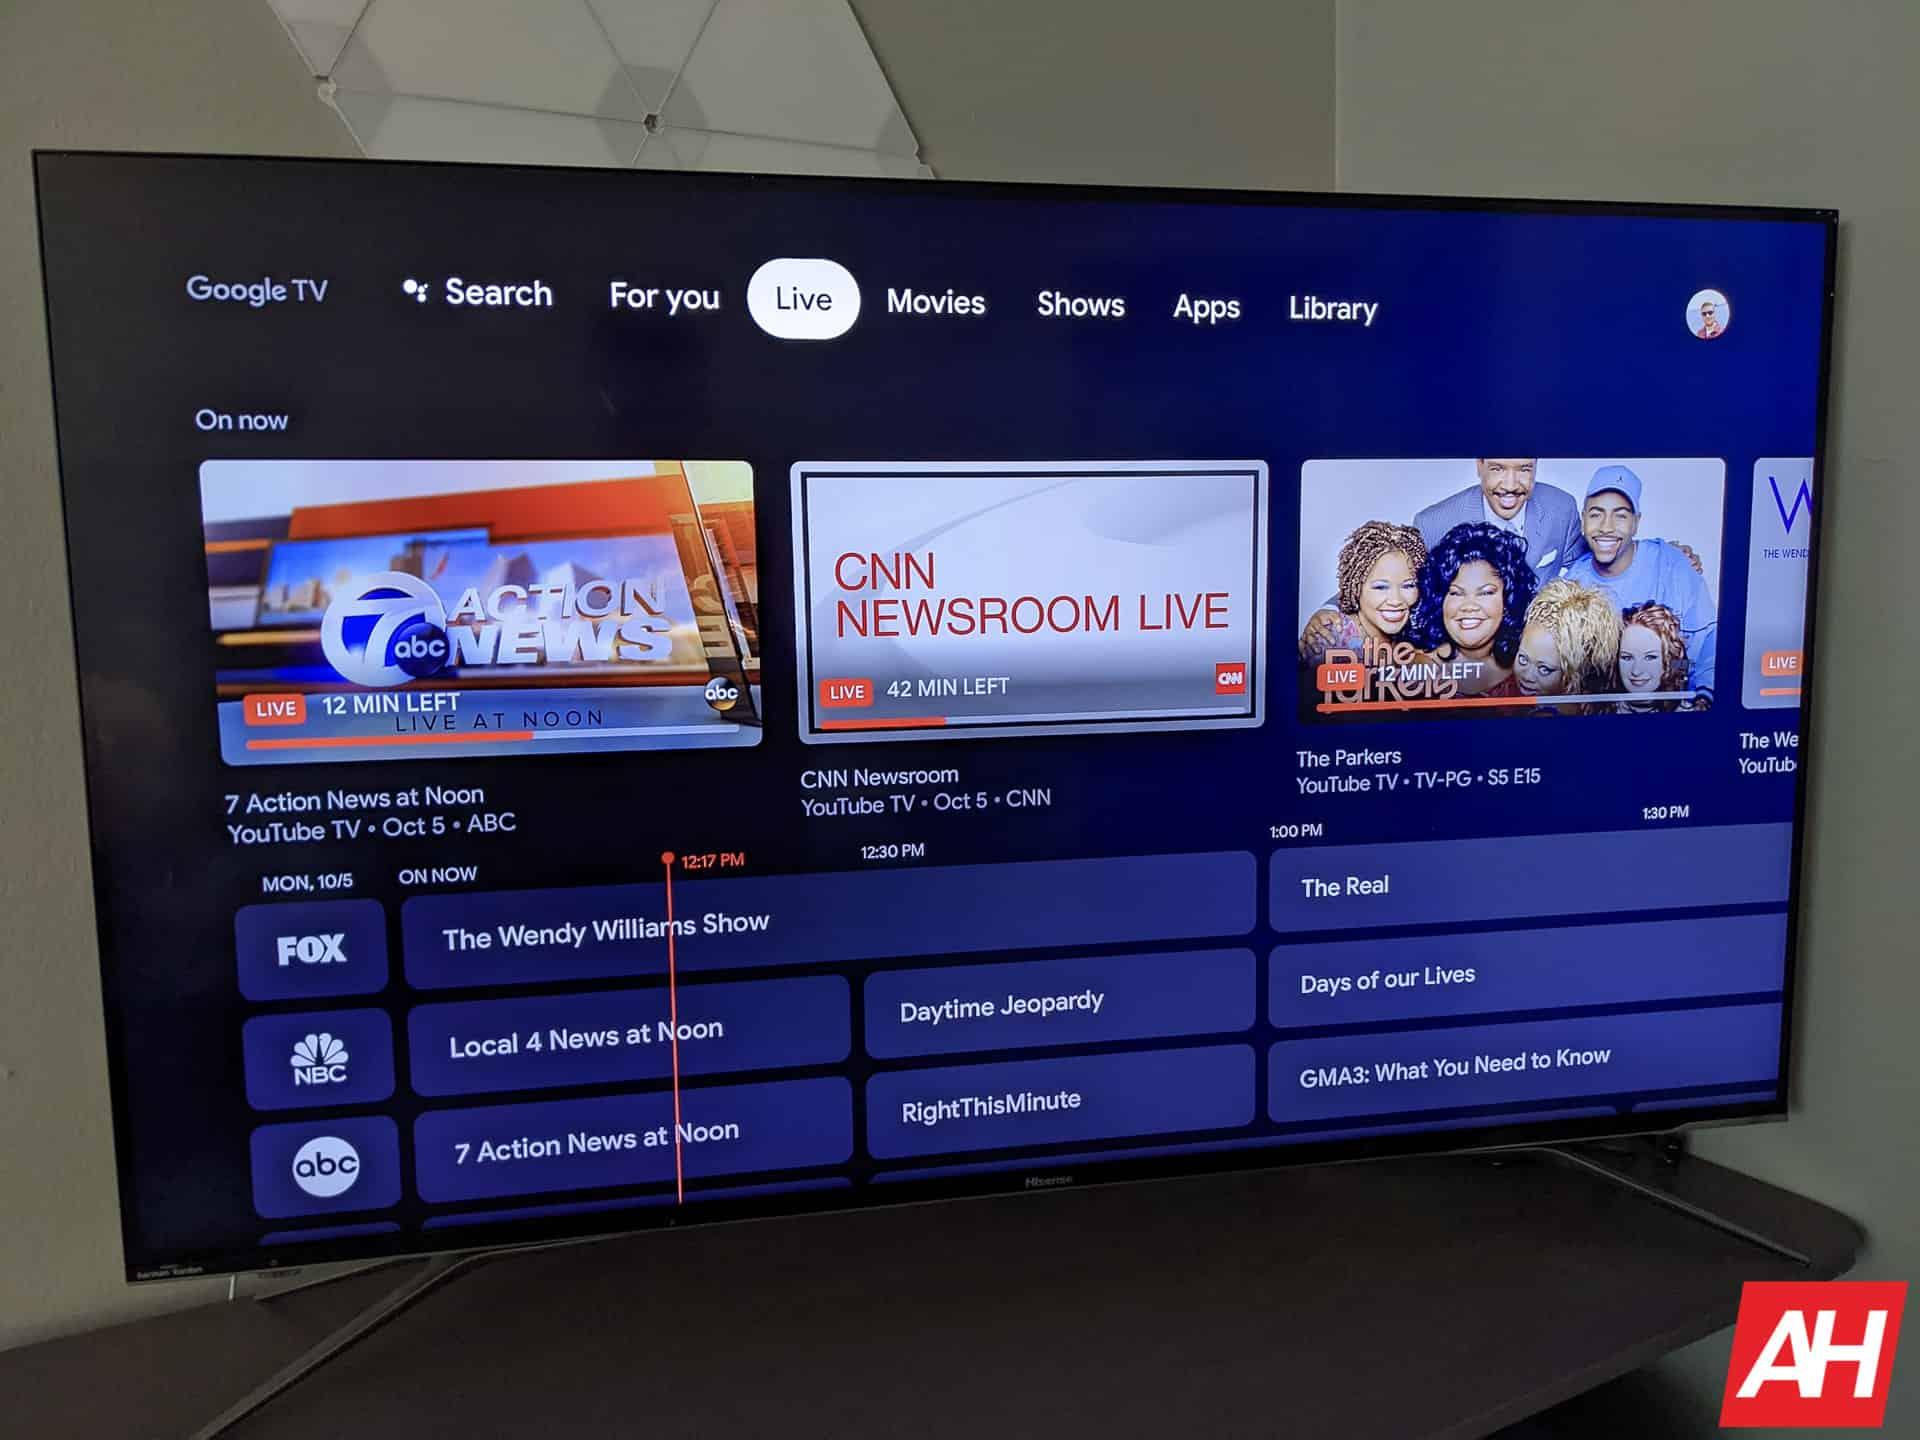 Google TV Chromecast AM AH 1